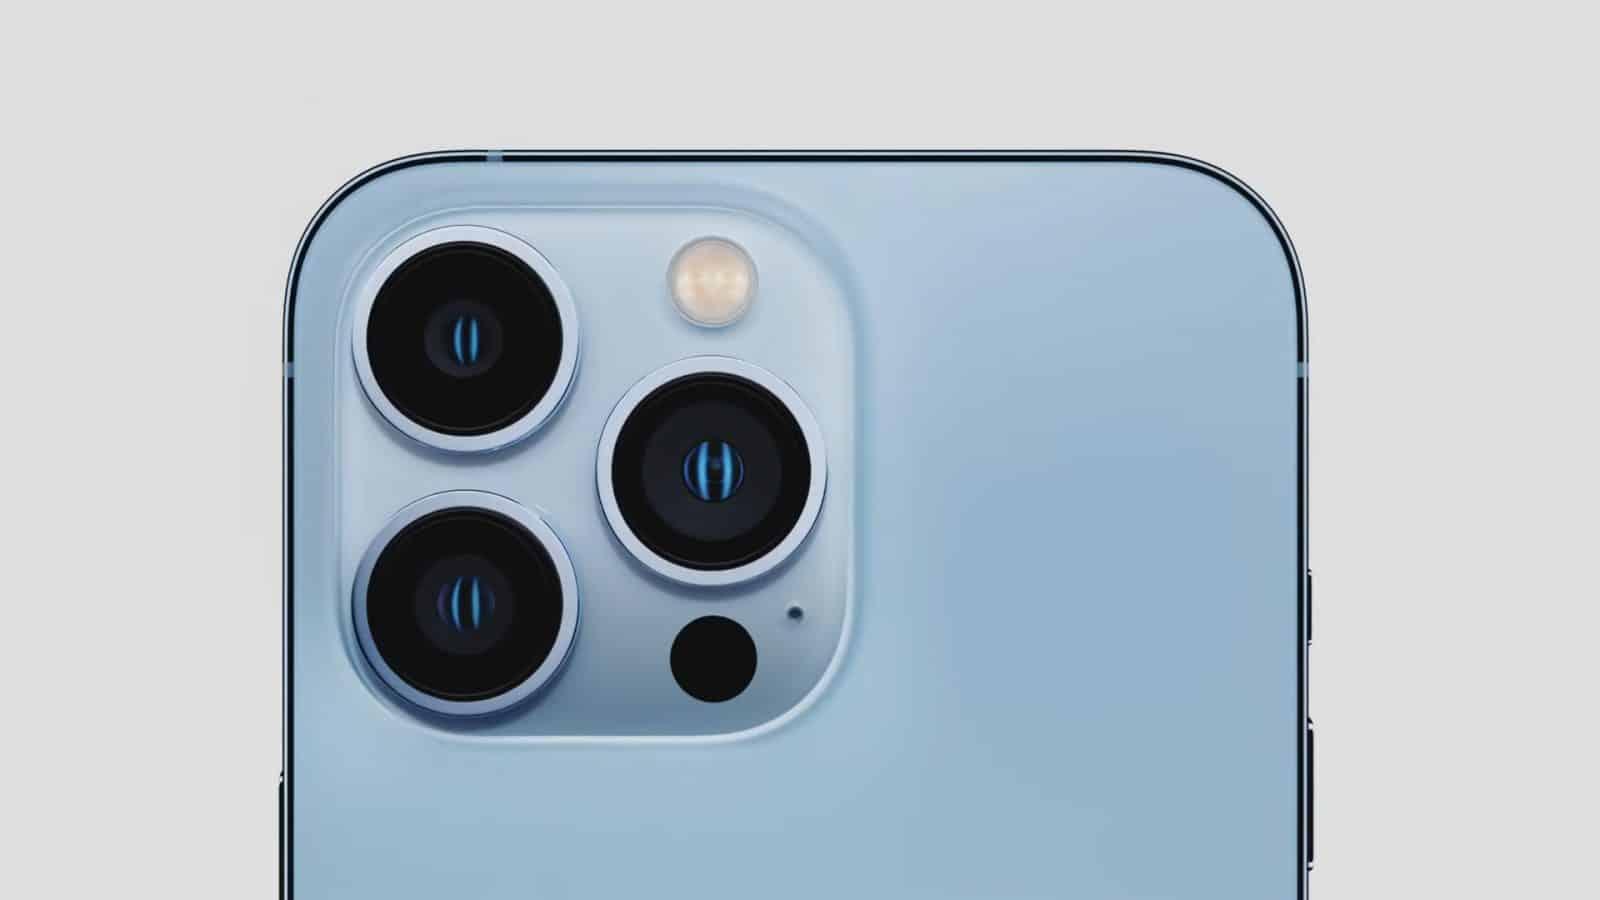 Tampilan Belakang iPhone 13 Pro